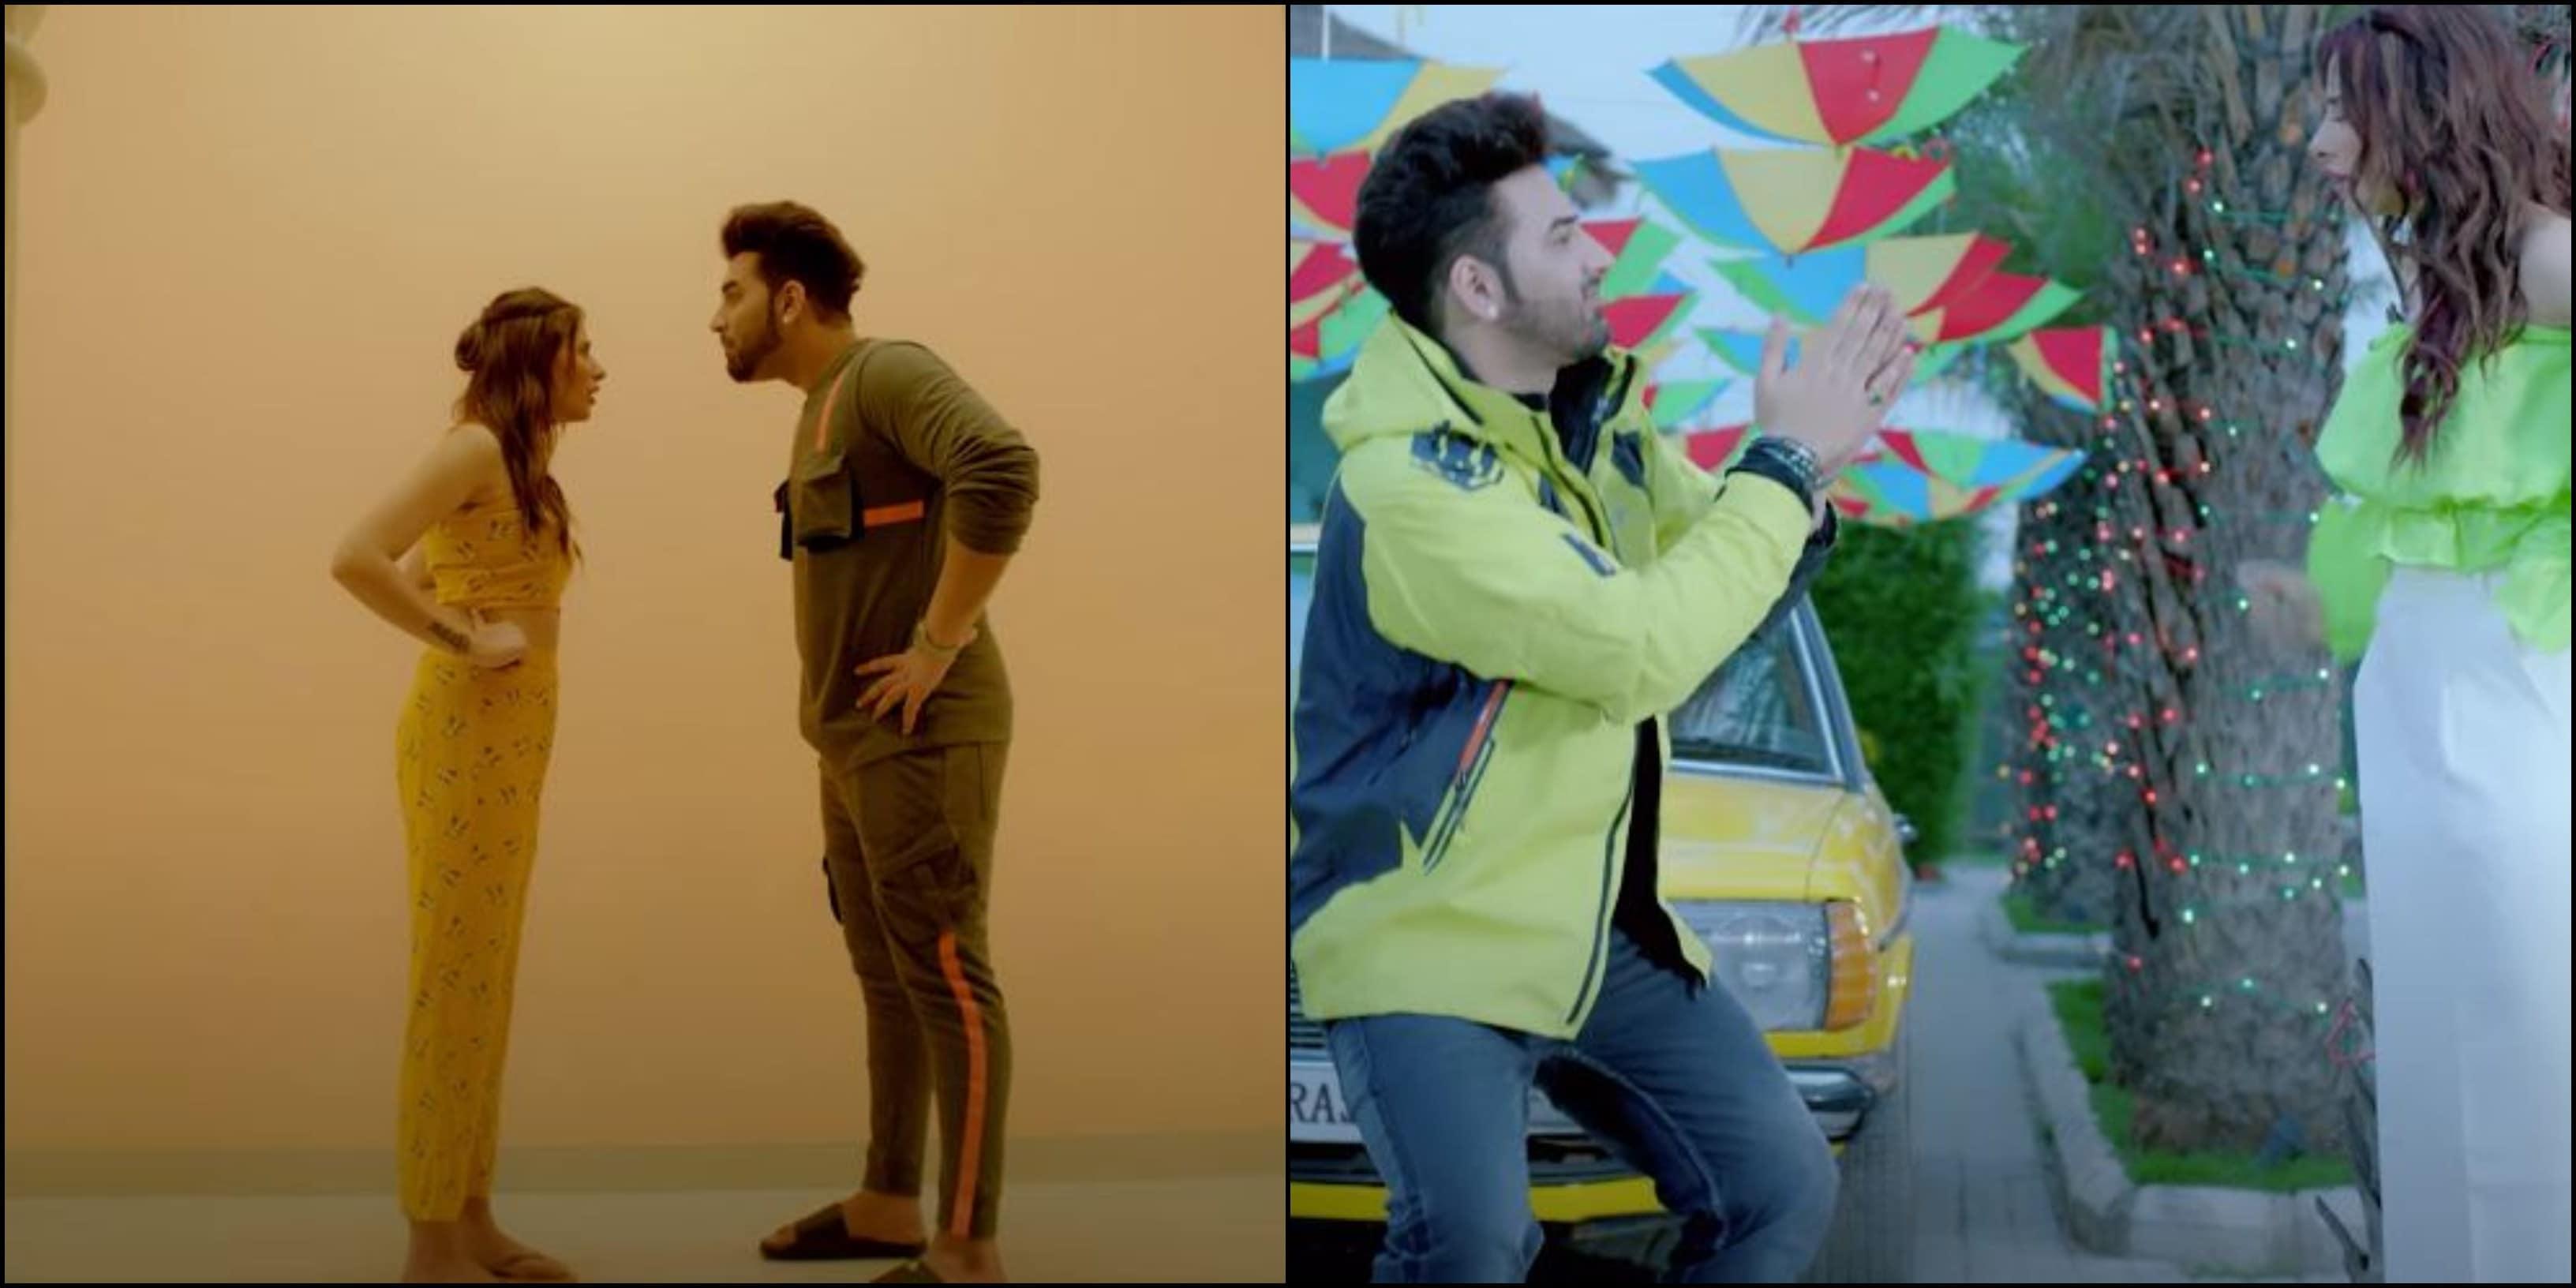 Ring: Paras Chhabra And Mahira Sharma's Chemistry Will Impress You, Unlike The Music Video; Watch